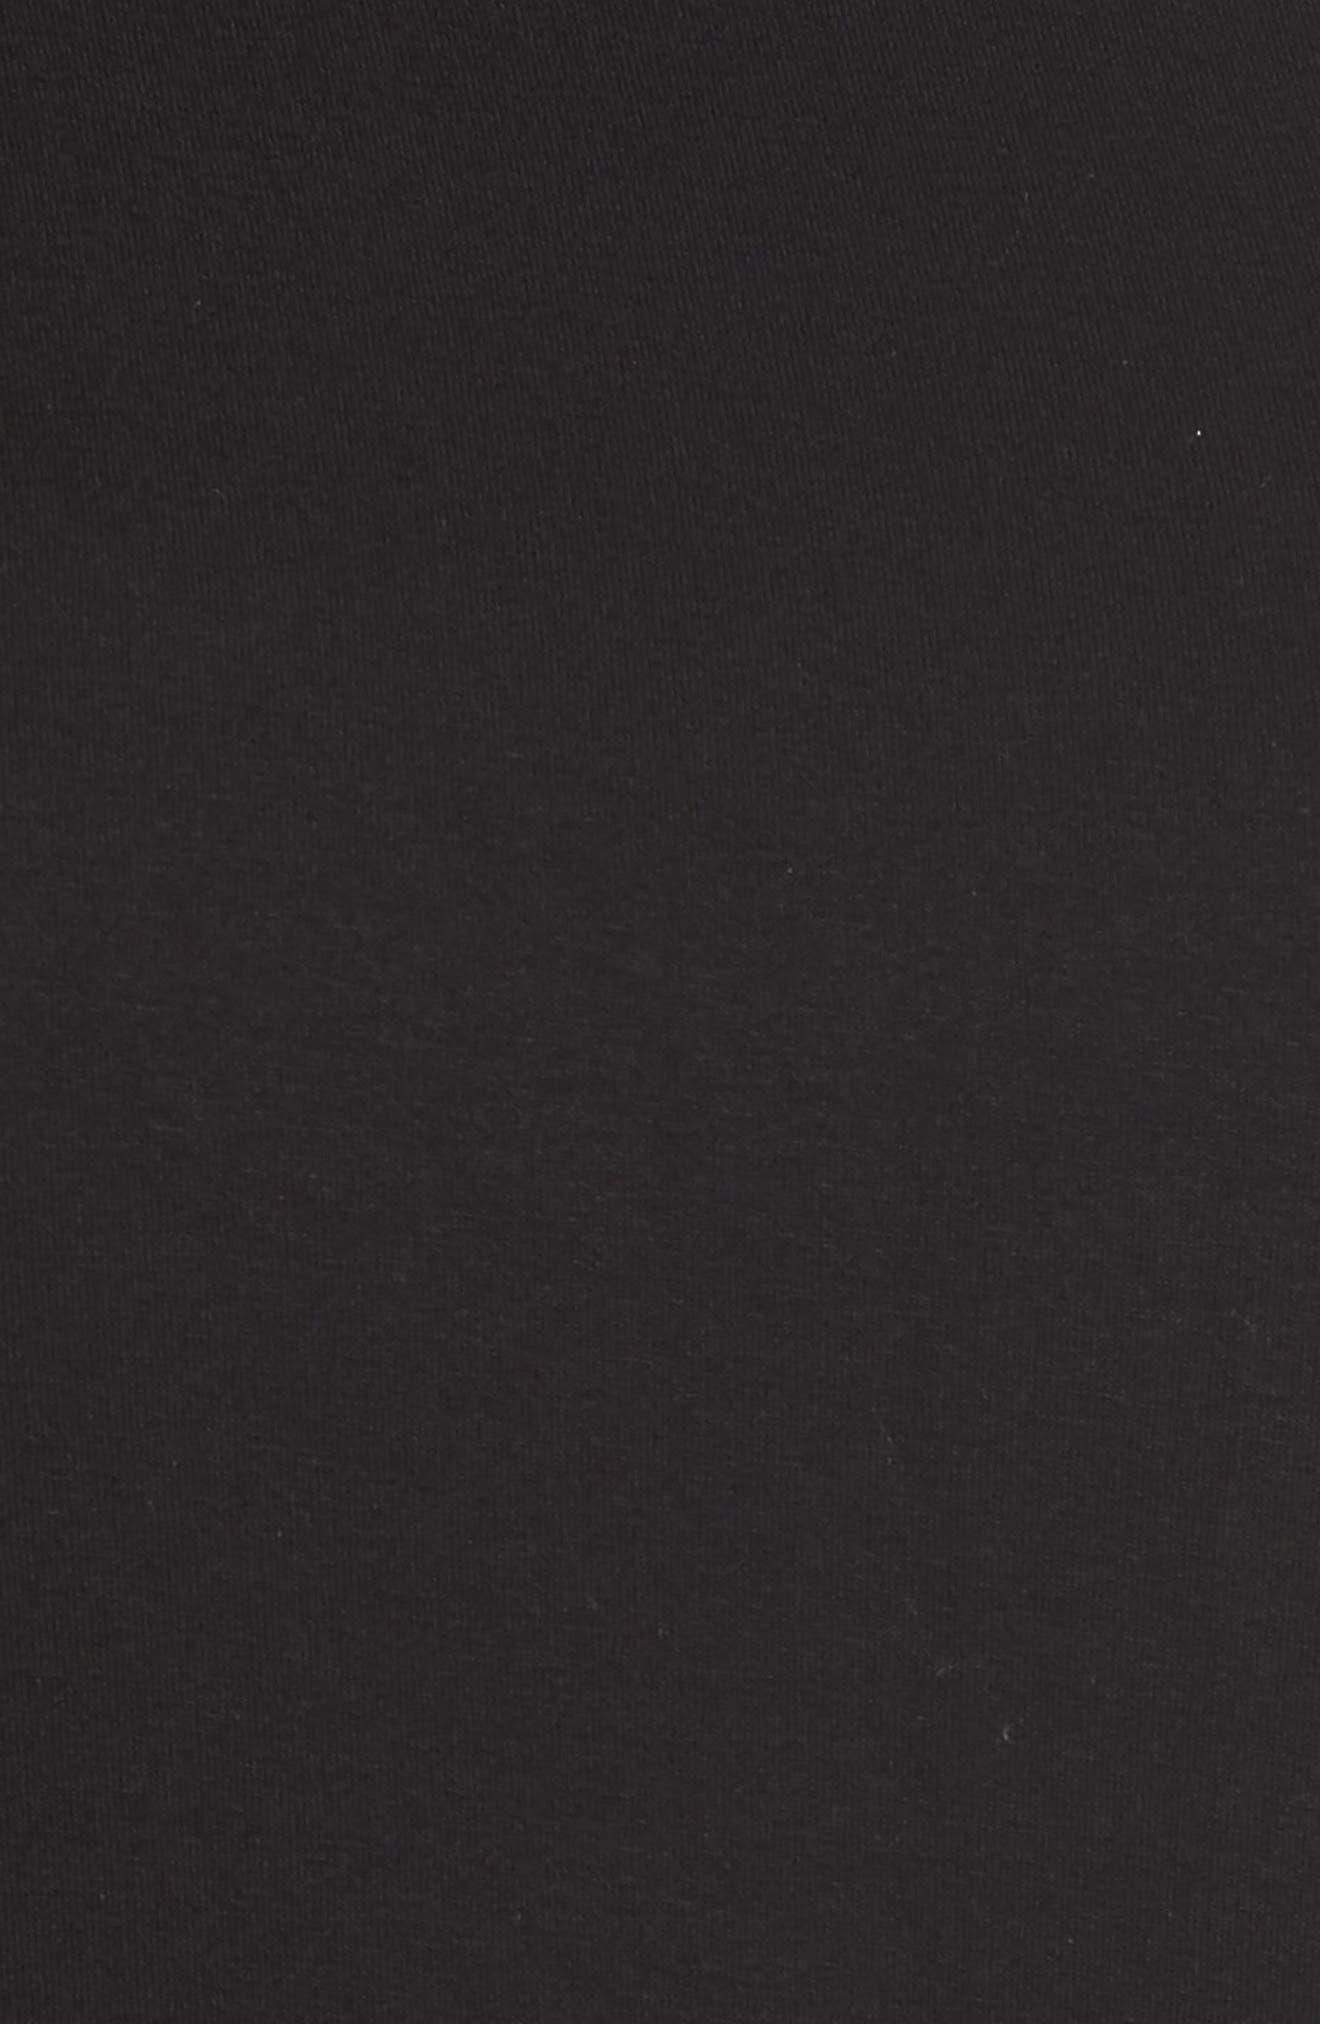 Smocked Ruffle Sleeve Top,                             Alternate thumbnail 6, color,                             002